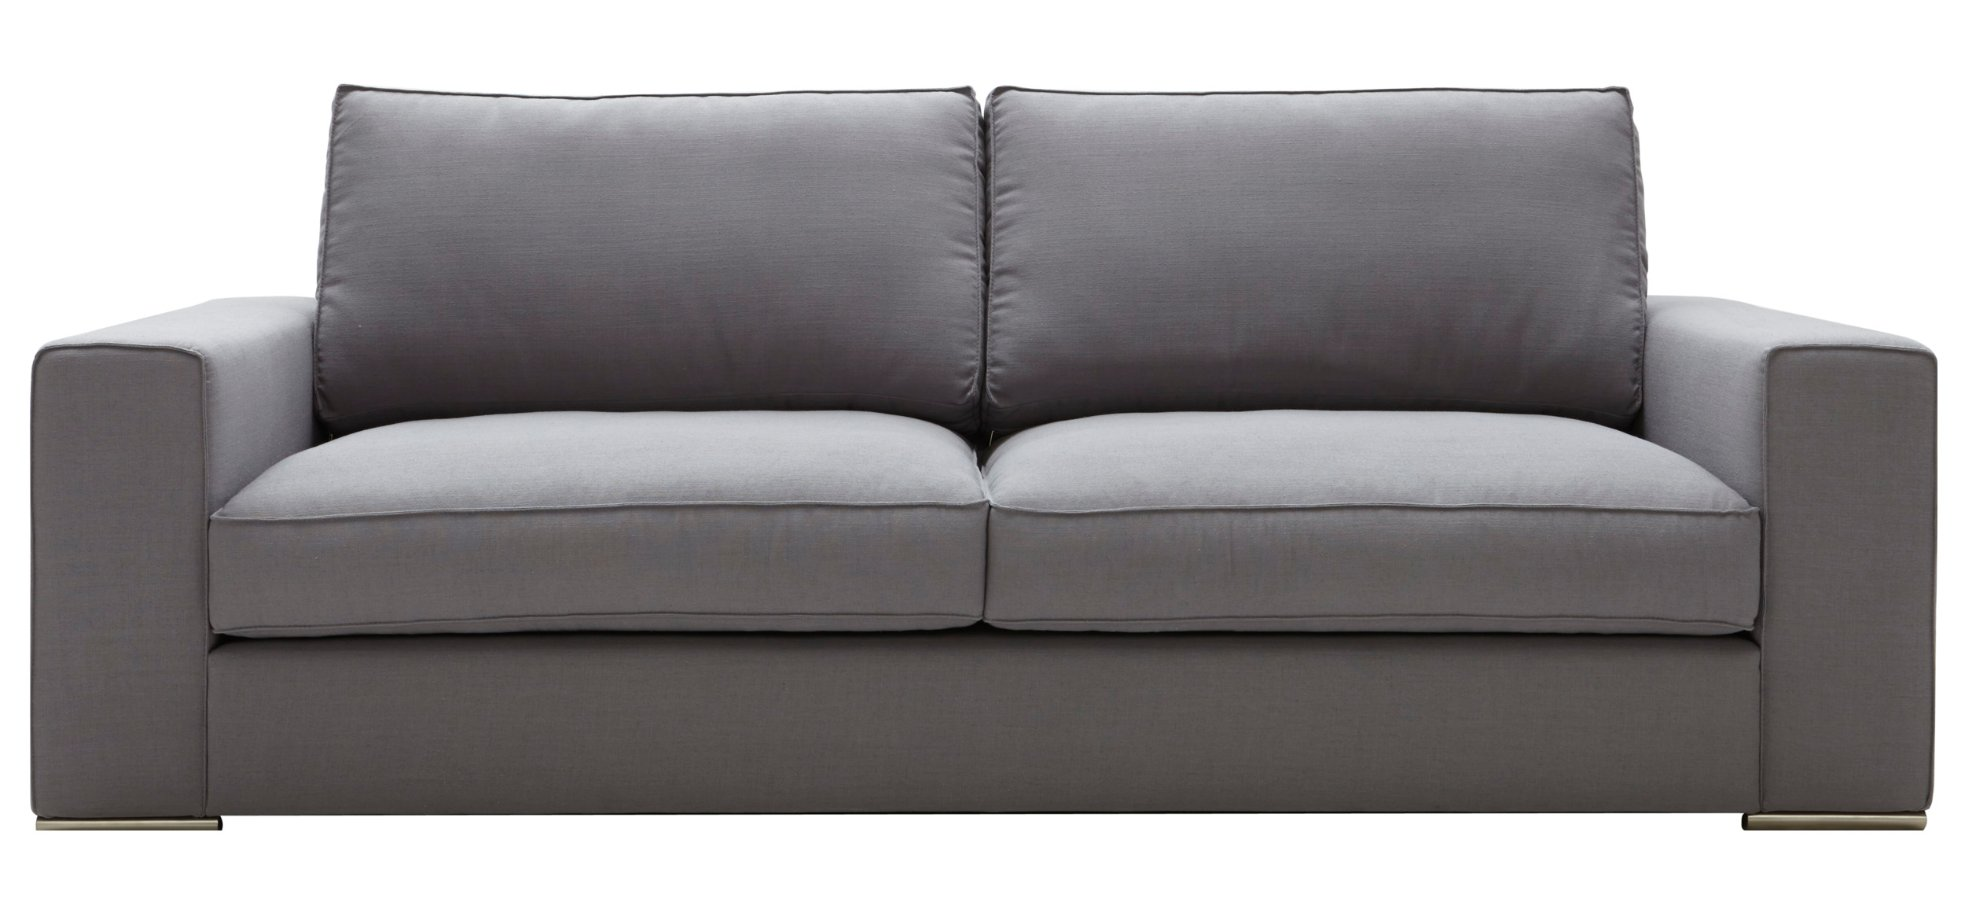 Full Size of Natura Sofa Brooklyn Kansas Love Couch Denver Livingston Kaufen Home Newport Gebraucht Pasadena 3 Sitzer Mit Grauem Stoffbezug Sofas Konfigurator Polyrattan Sofa Natura Sofa